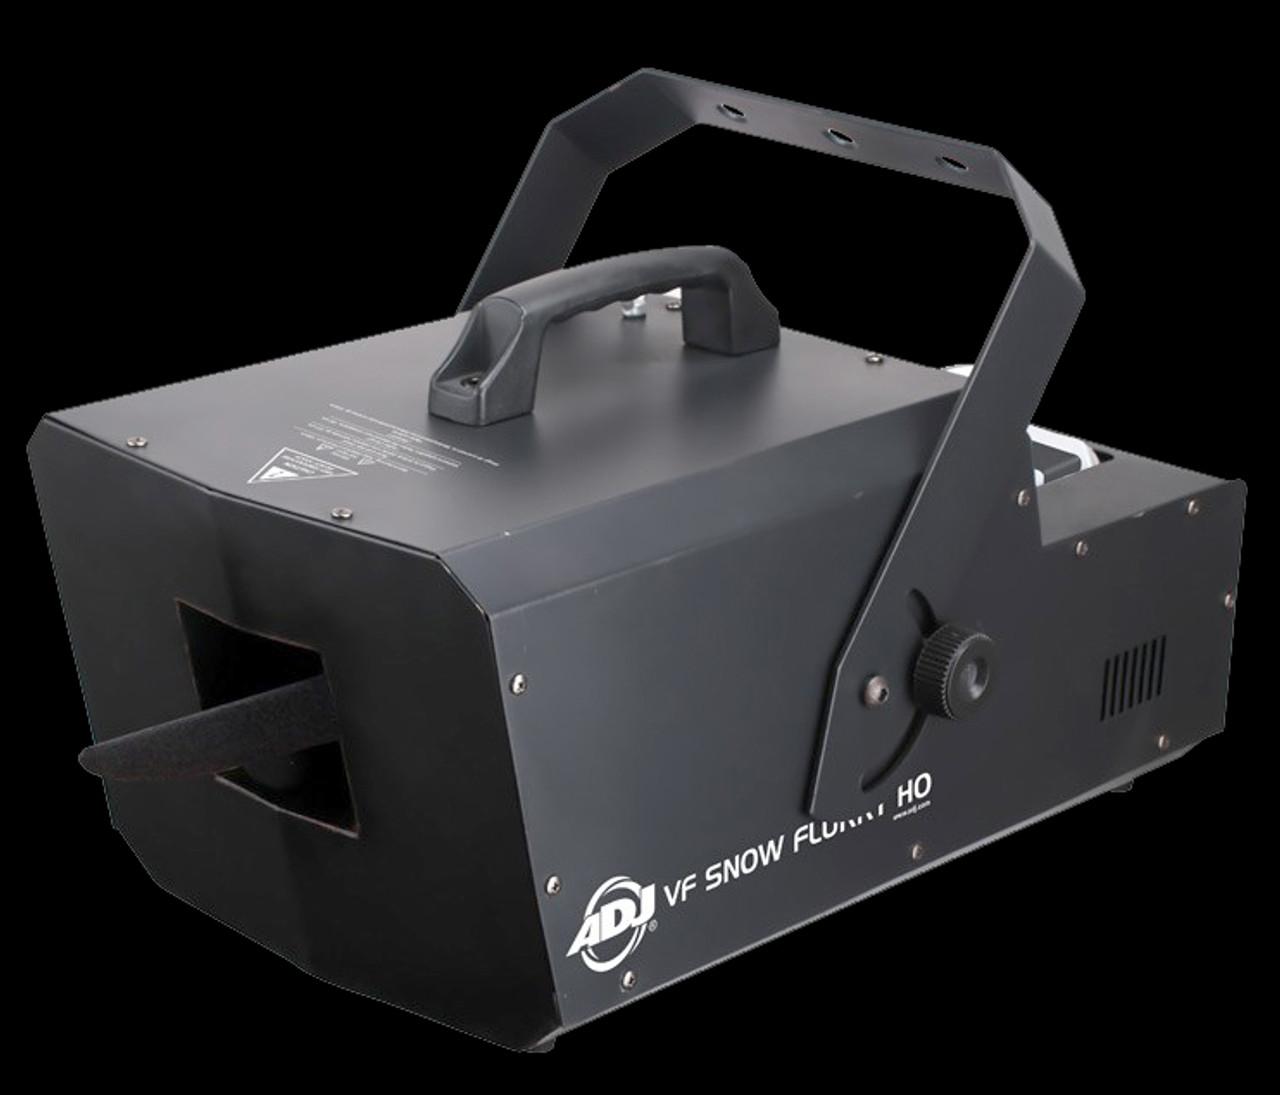 ADJ VF Snow Flurry HO 1250W Mobile DMX Snow Machine